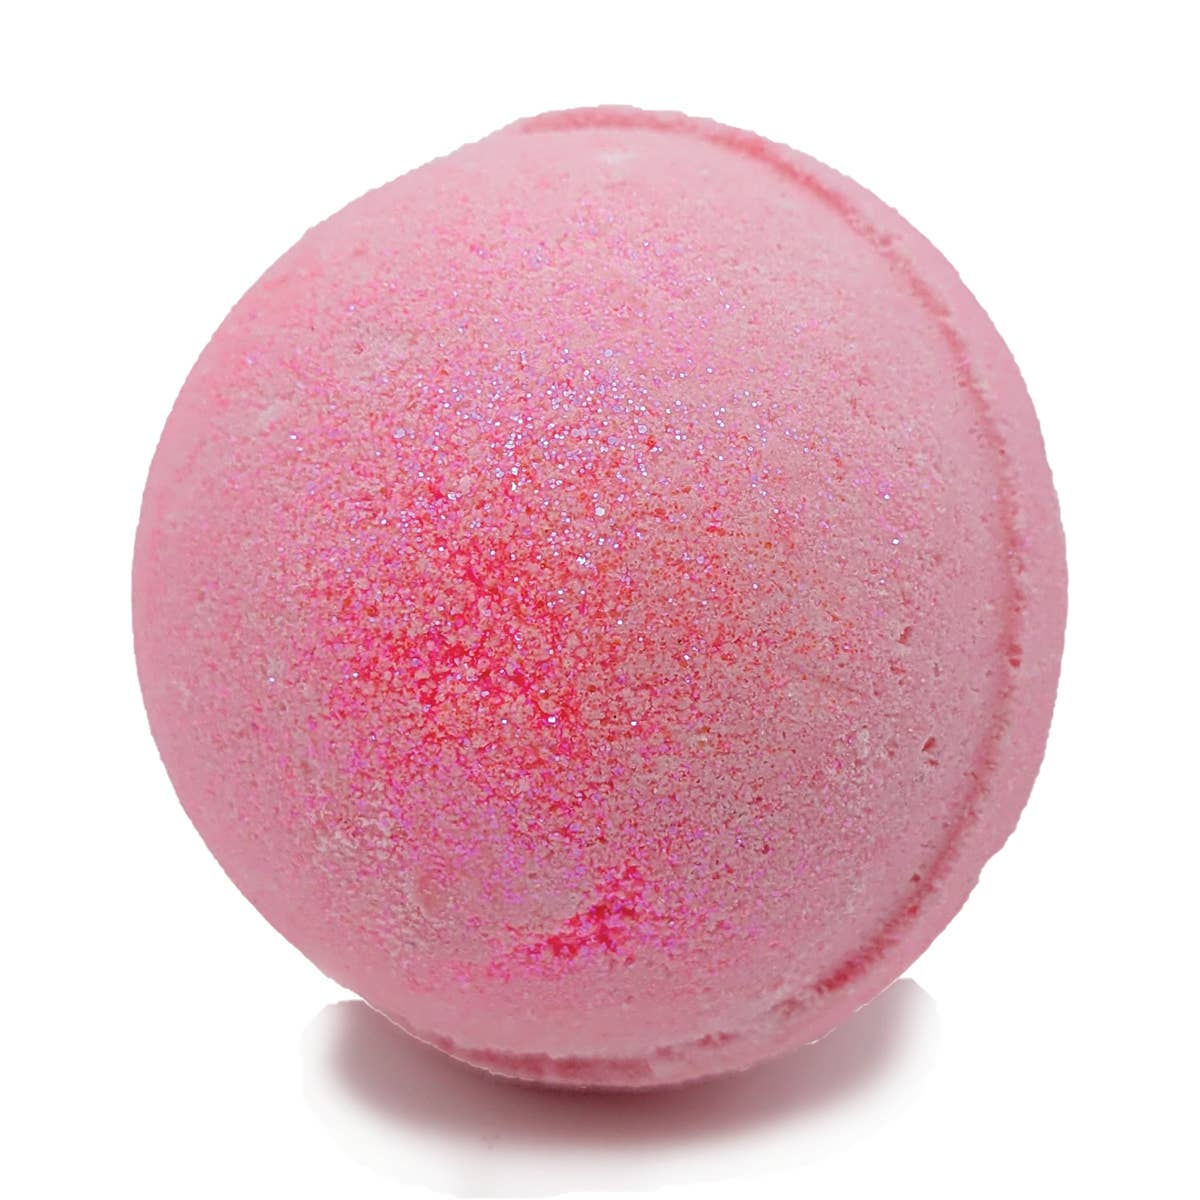 Evolve - Bath Bomb - Pink Sugar | Trada Marketplace